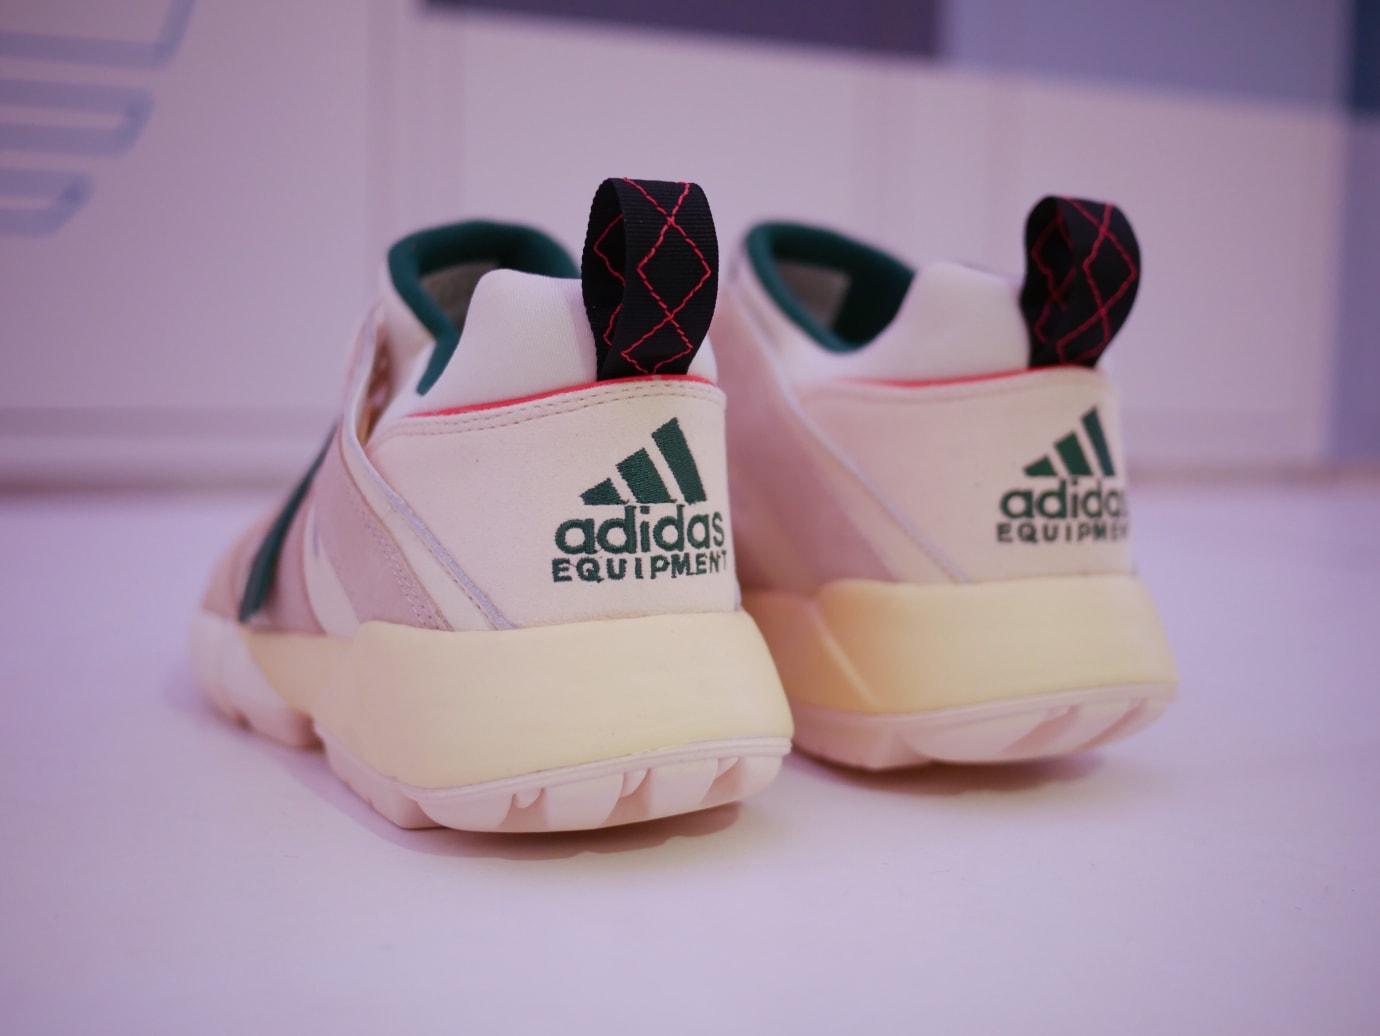 wholesale dealer 08679 99e98 ... Pusha T x Adidas EQT Cushion 2 ComplexCon Heel